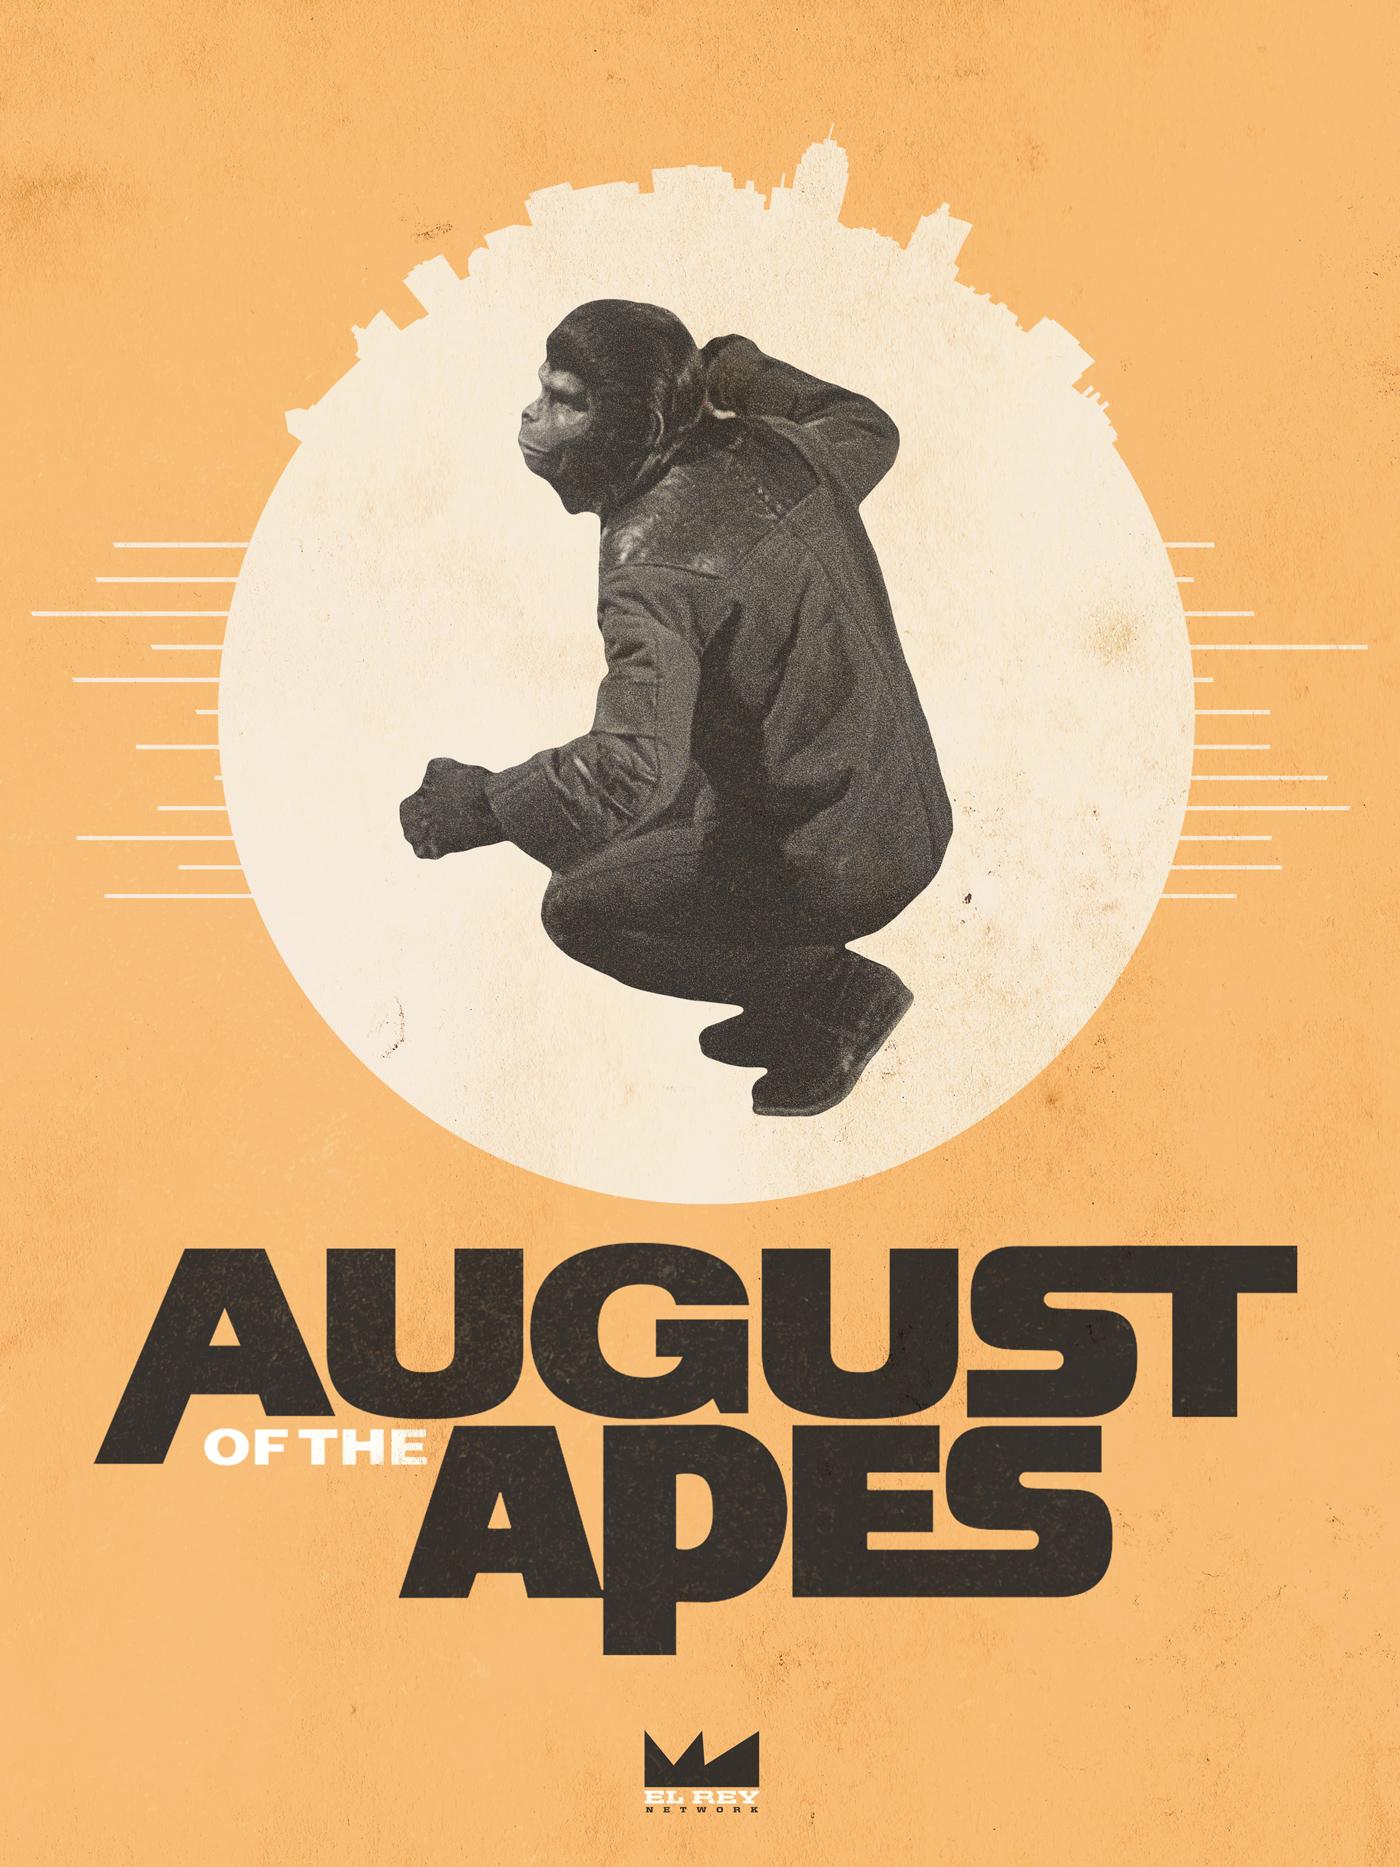 Planet of the Apes Marathon